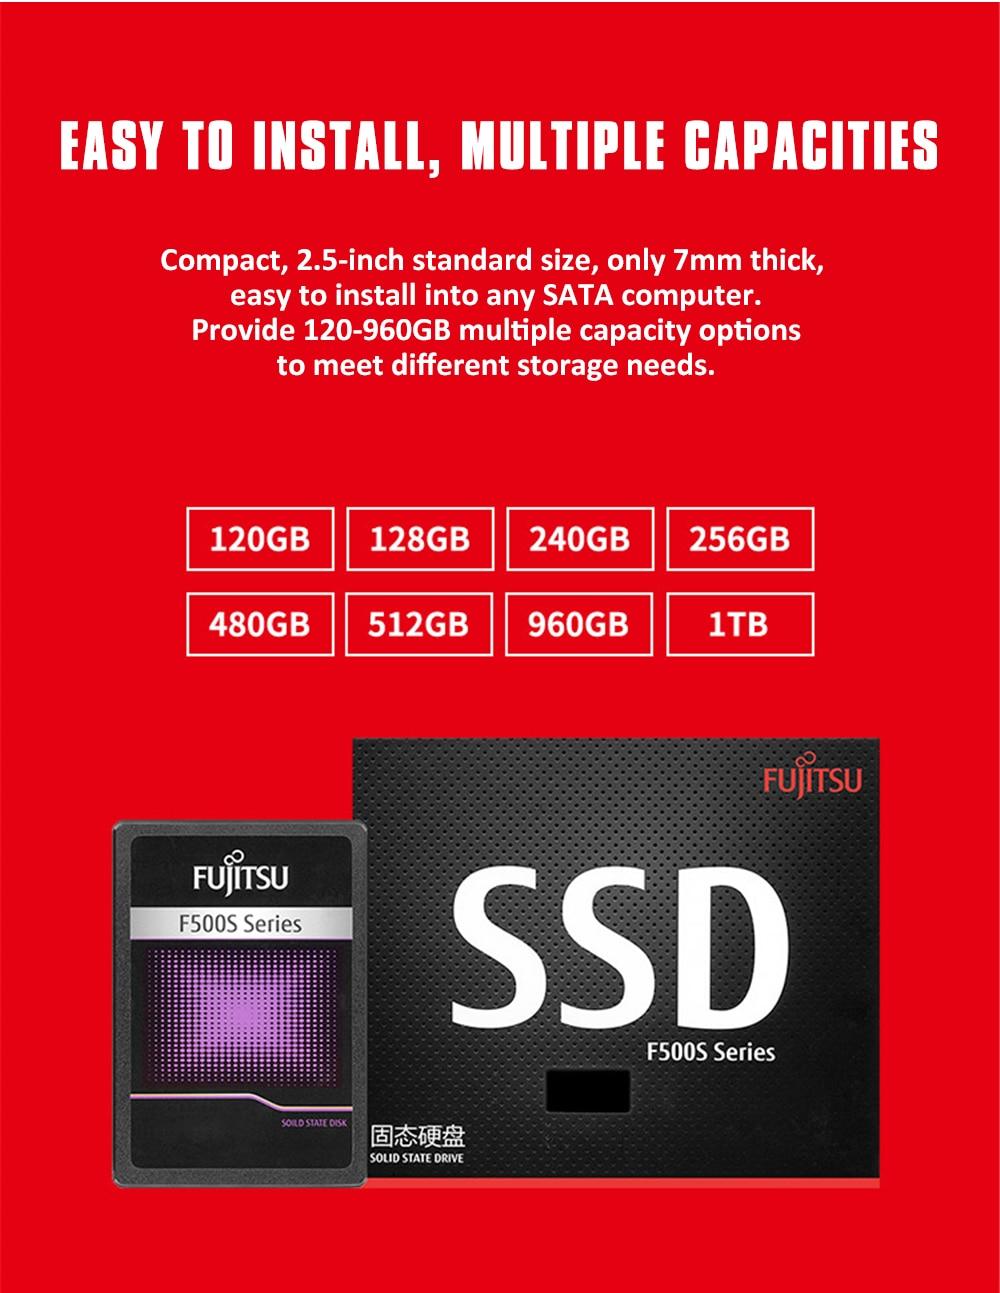 "FUJITSU 2.5"" ssd 1tb sata3 ssd 1024G 3D NAND Flash SMI/Phison/Realtek TLC ssd hard drive Solid State Drives for desktop laptop 20"